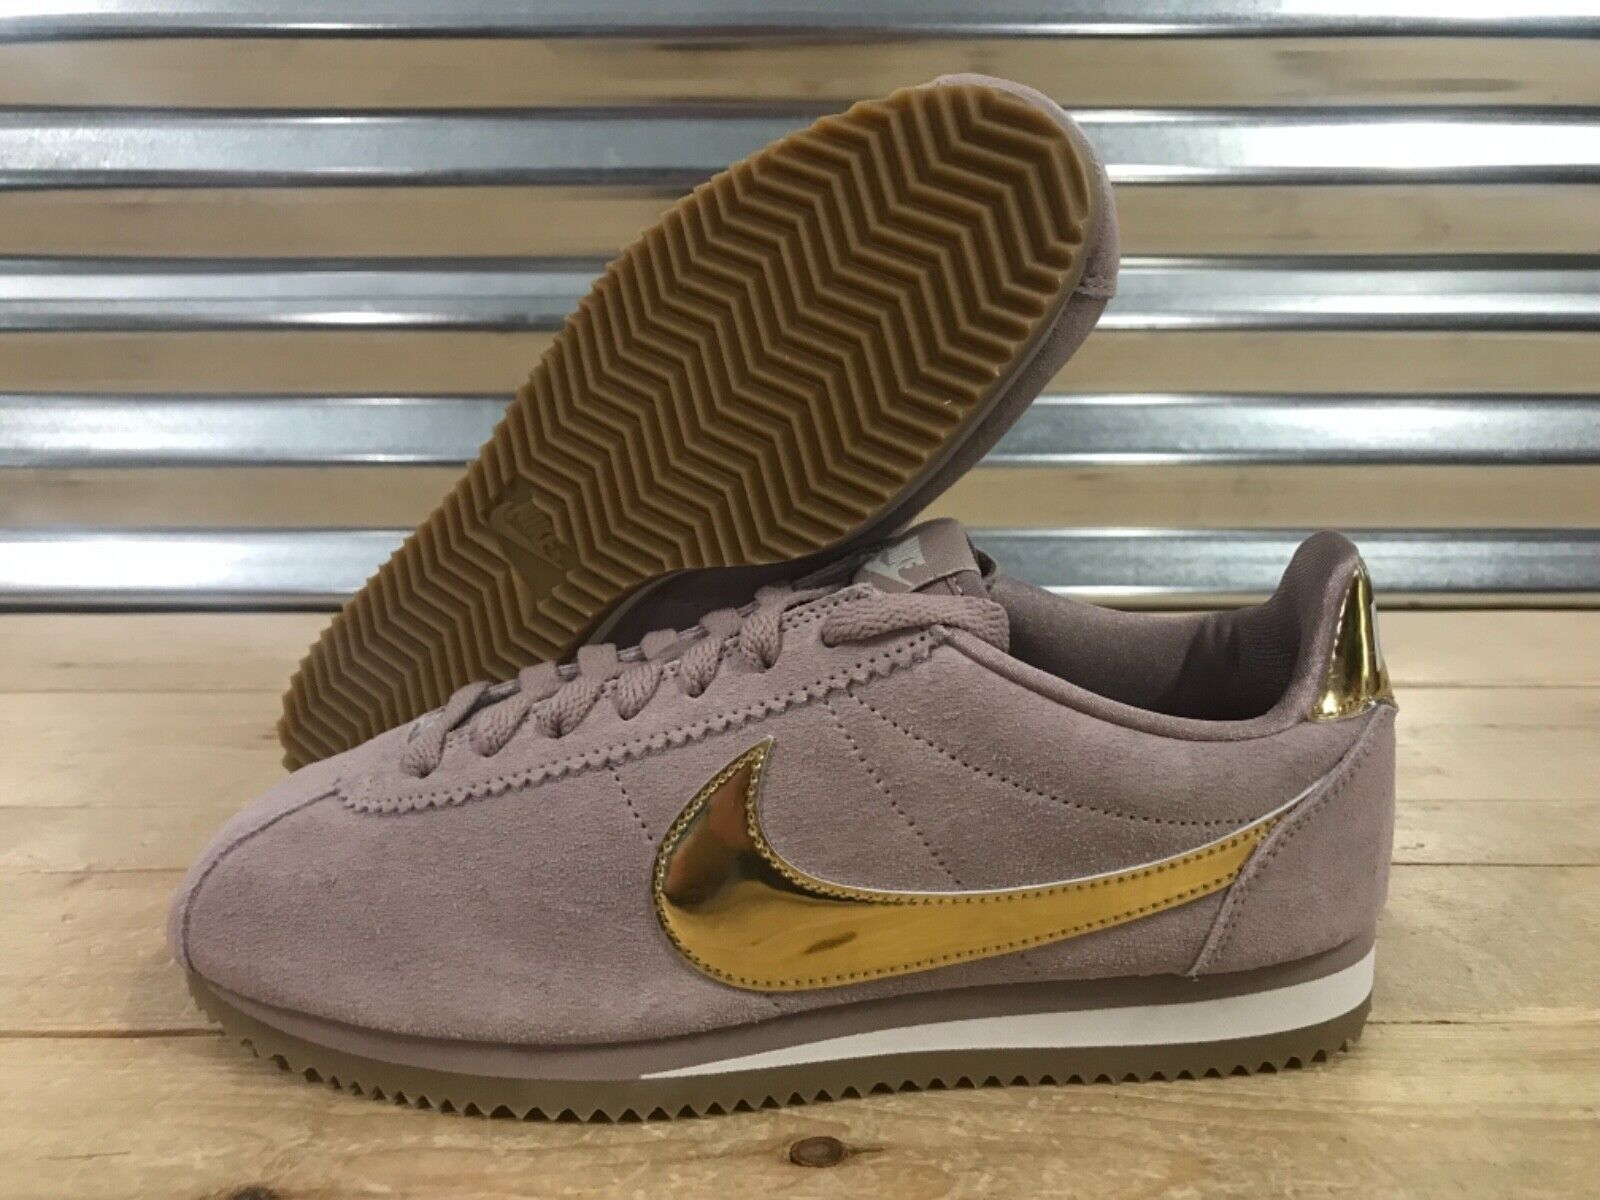 damen Nike Classic Cortez SE schuhe Diffused Taupe Mtlc Gold SZ ( 902856-204 )